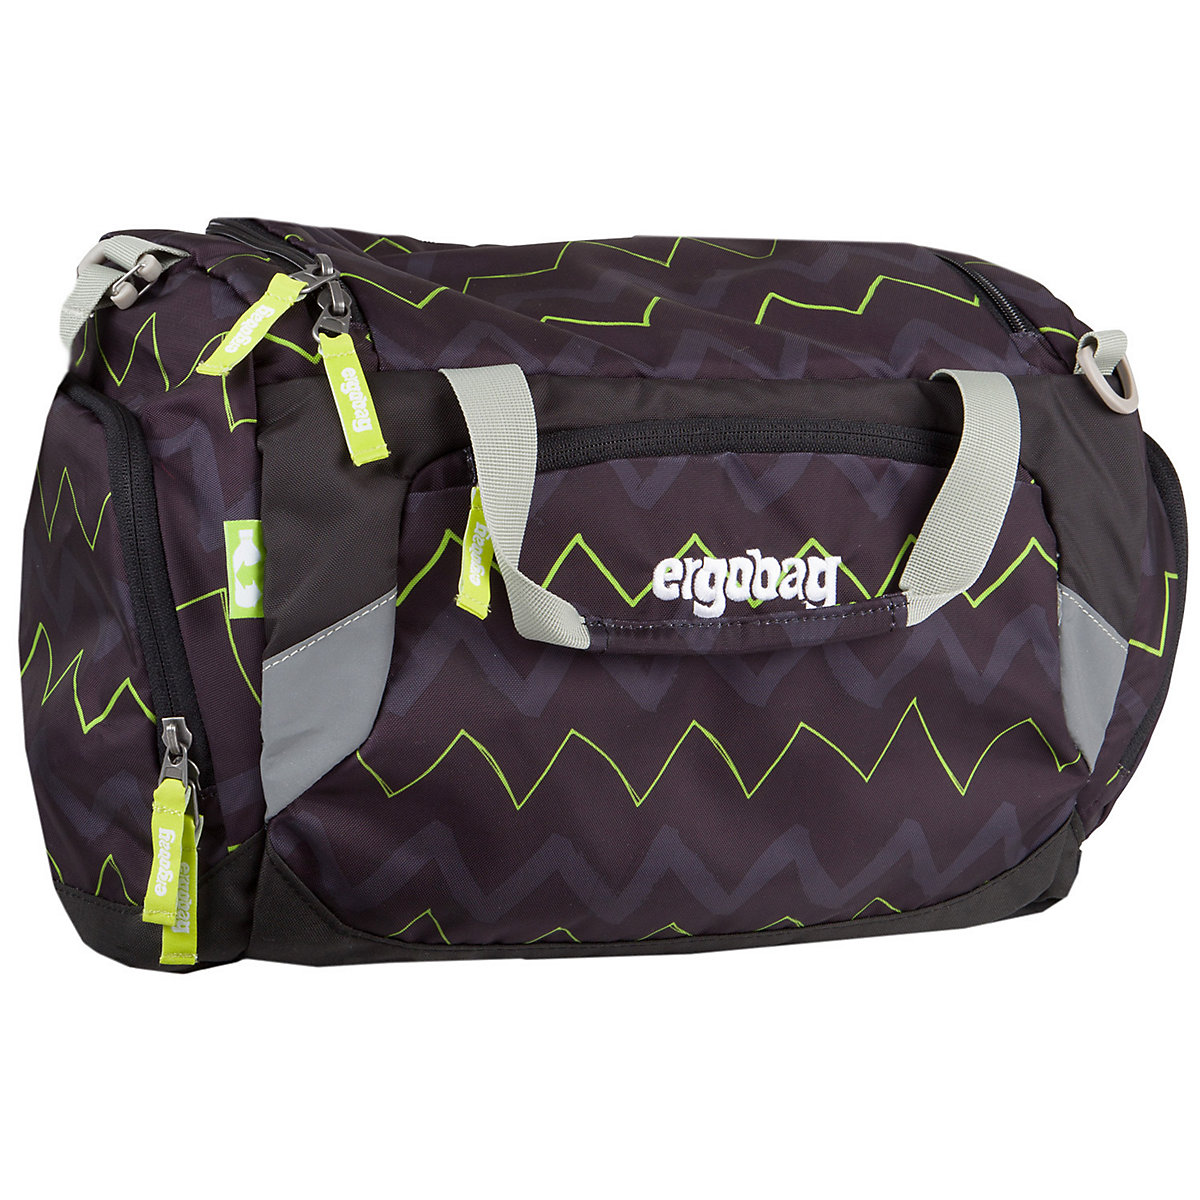 ergobag ergobag sporttasche 40 cm schwarz mirapodo. Black Bedroom Furniture Sets. Home Design Ideas